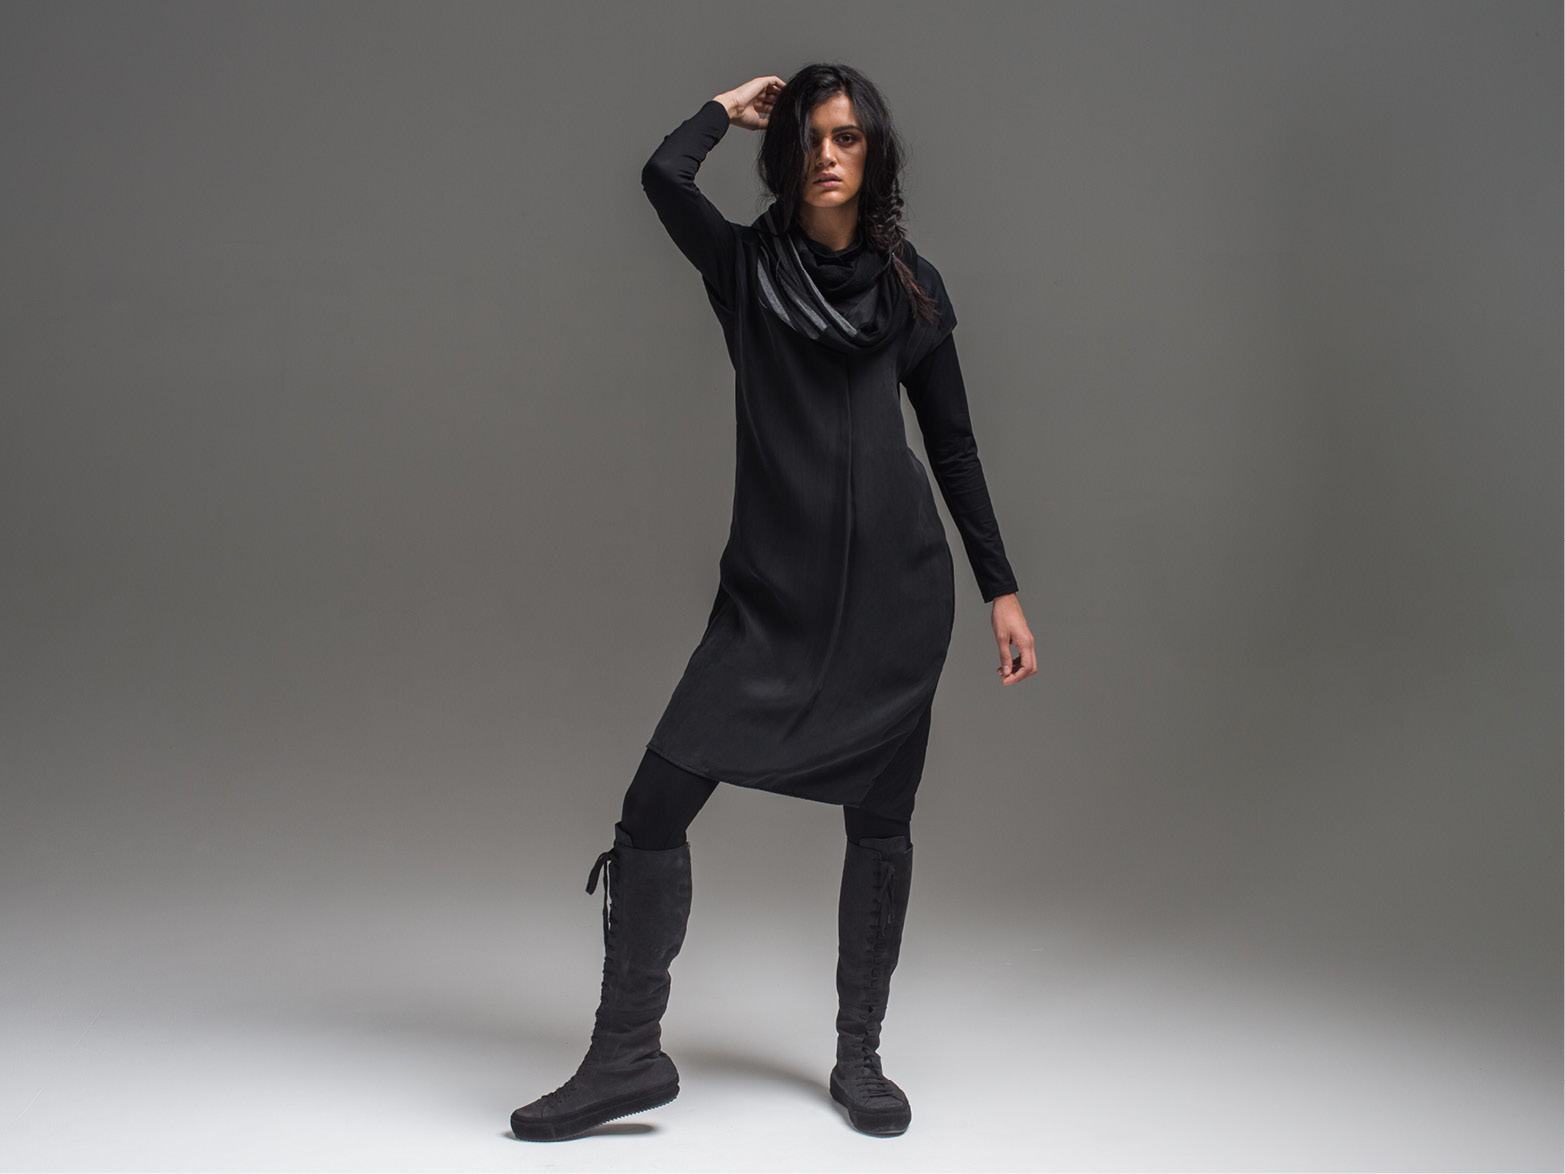 Multitude top, Lanky legs, Juxtapose dress + Mmerrrino scarf